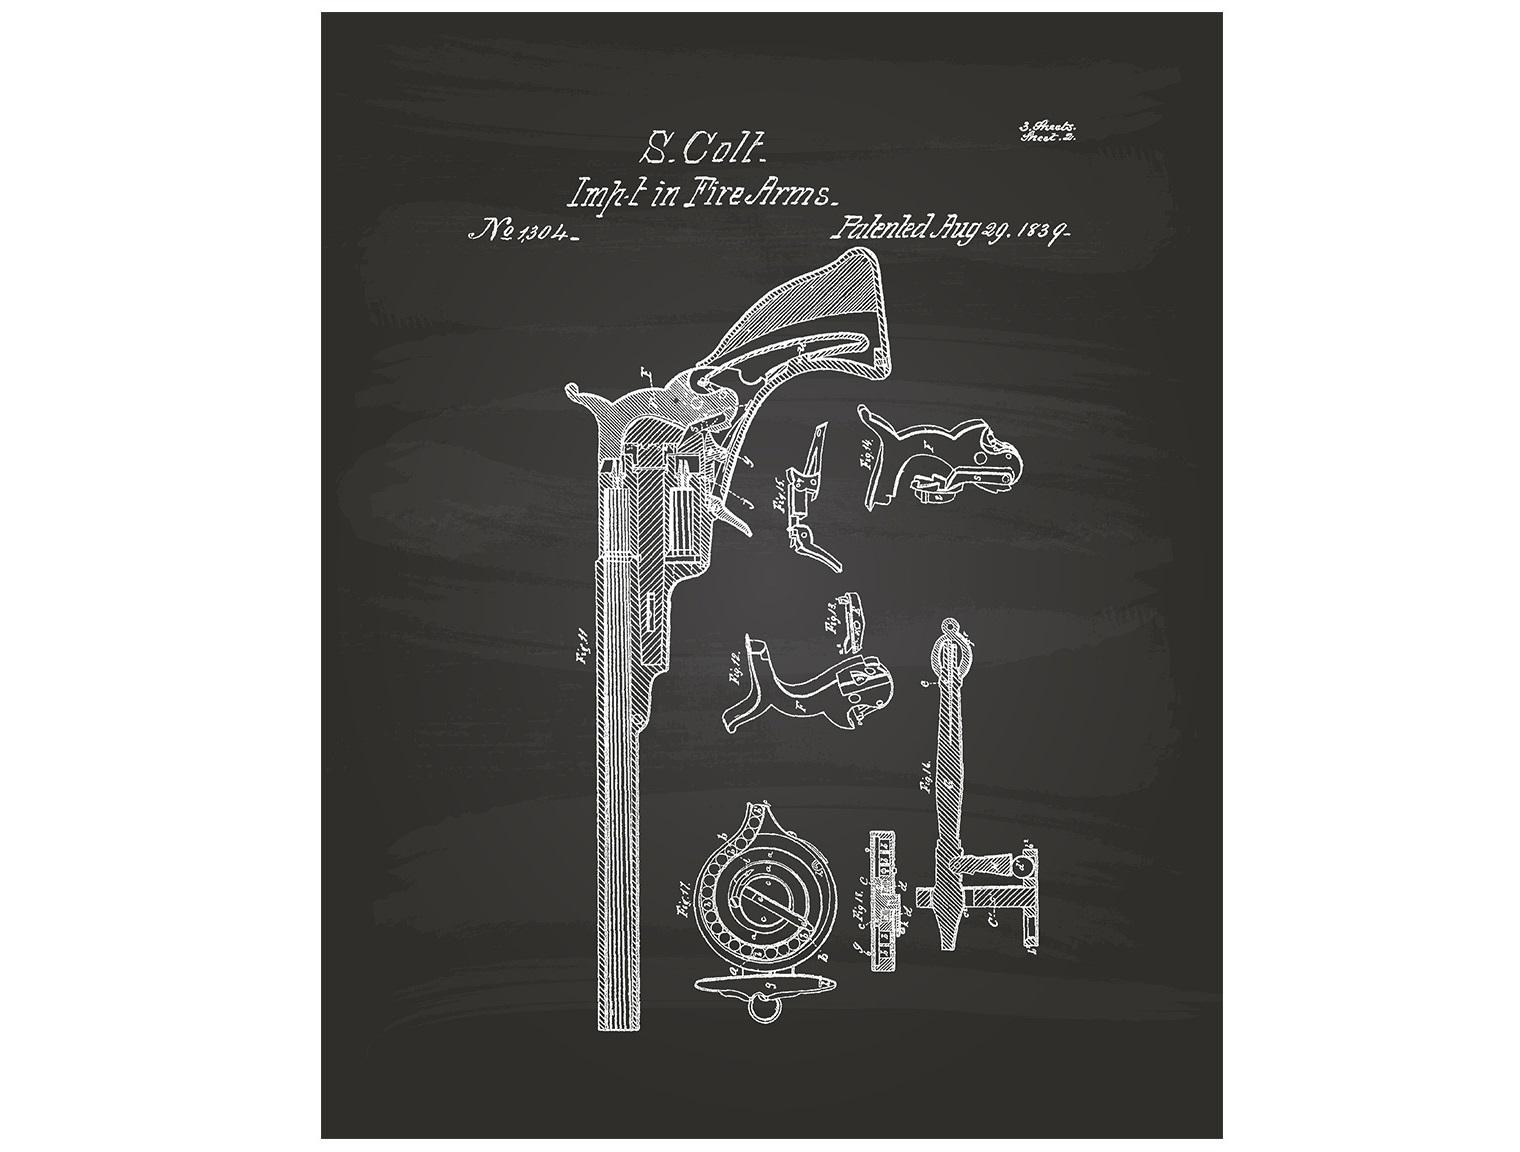 Постер Colt 1839Постеры<br><br><br>Material: Холст<br>Ширина см: 40<br>Высота см: 60<br>Глубина см: 6